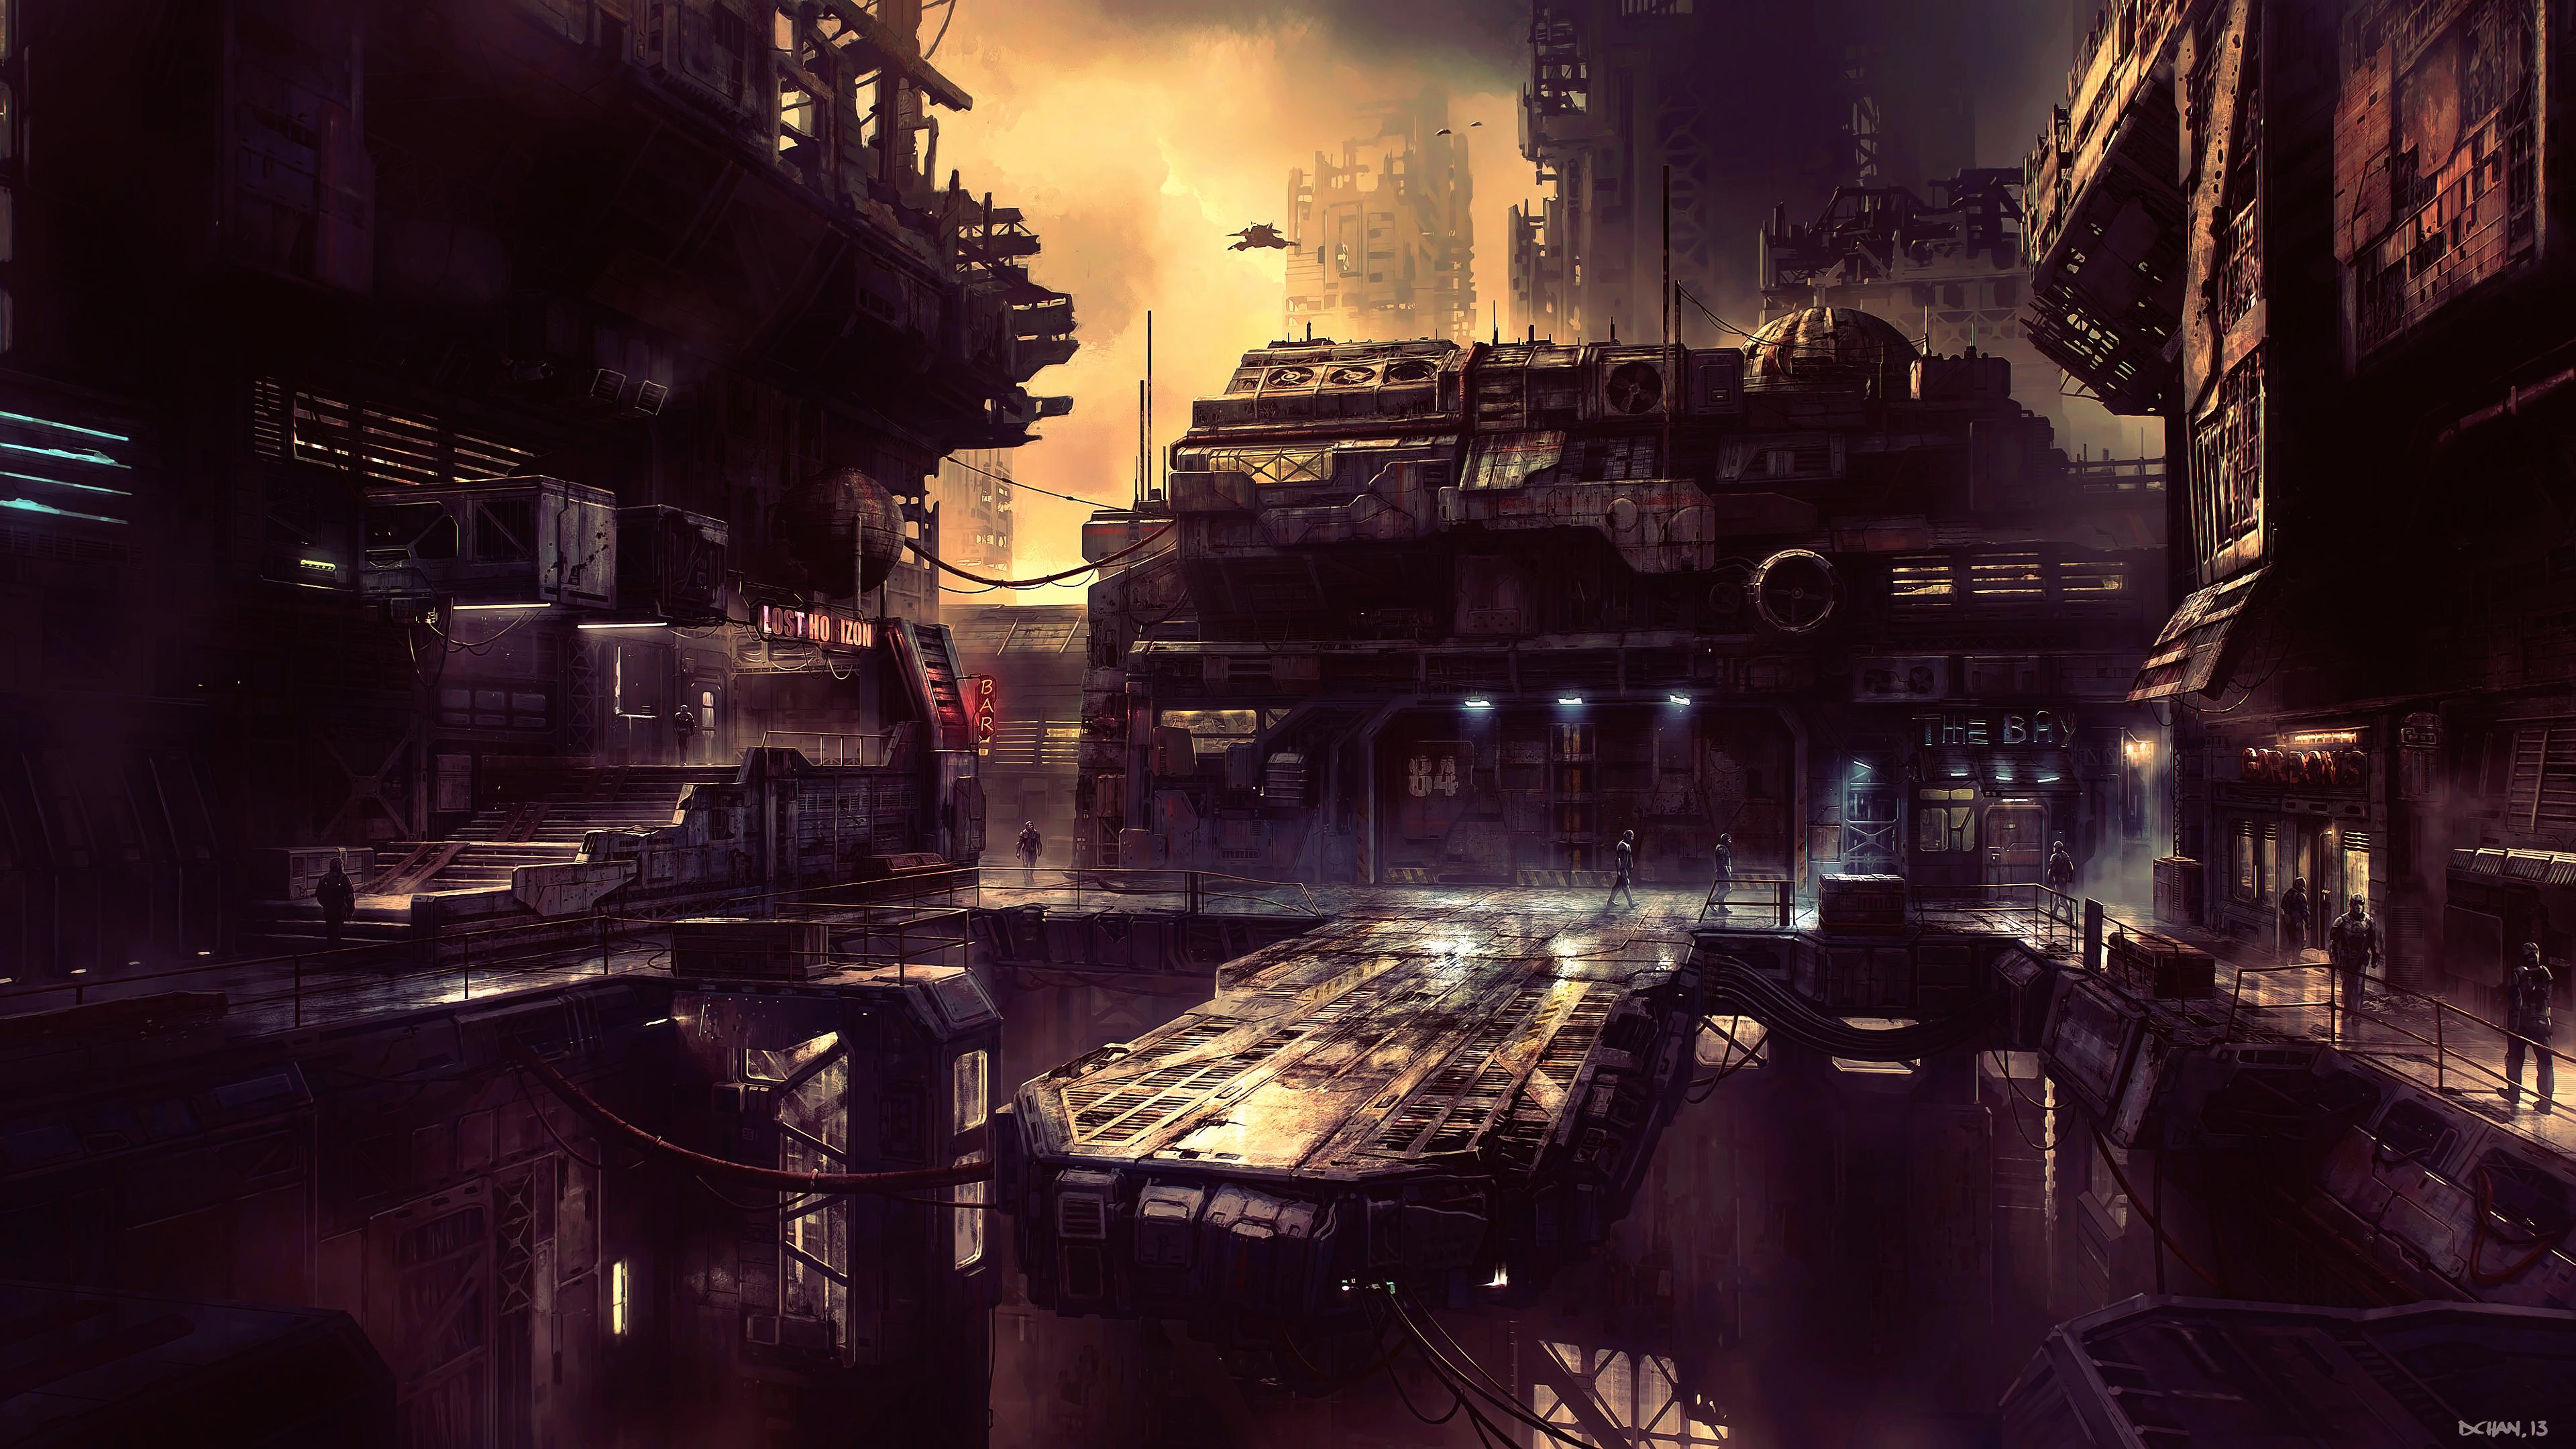 science fiction future city 4k 1540755054 - Science Fiction Future City 4k - scifi wallpapers, science fiction wallpapers, hd-wallpapers, future wallpapers, digital art wallpapers, city wallpapers, artwork wallpapers, artist wallpapers, 4k-wallpapers